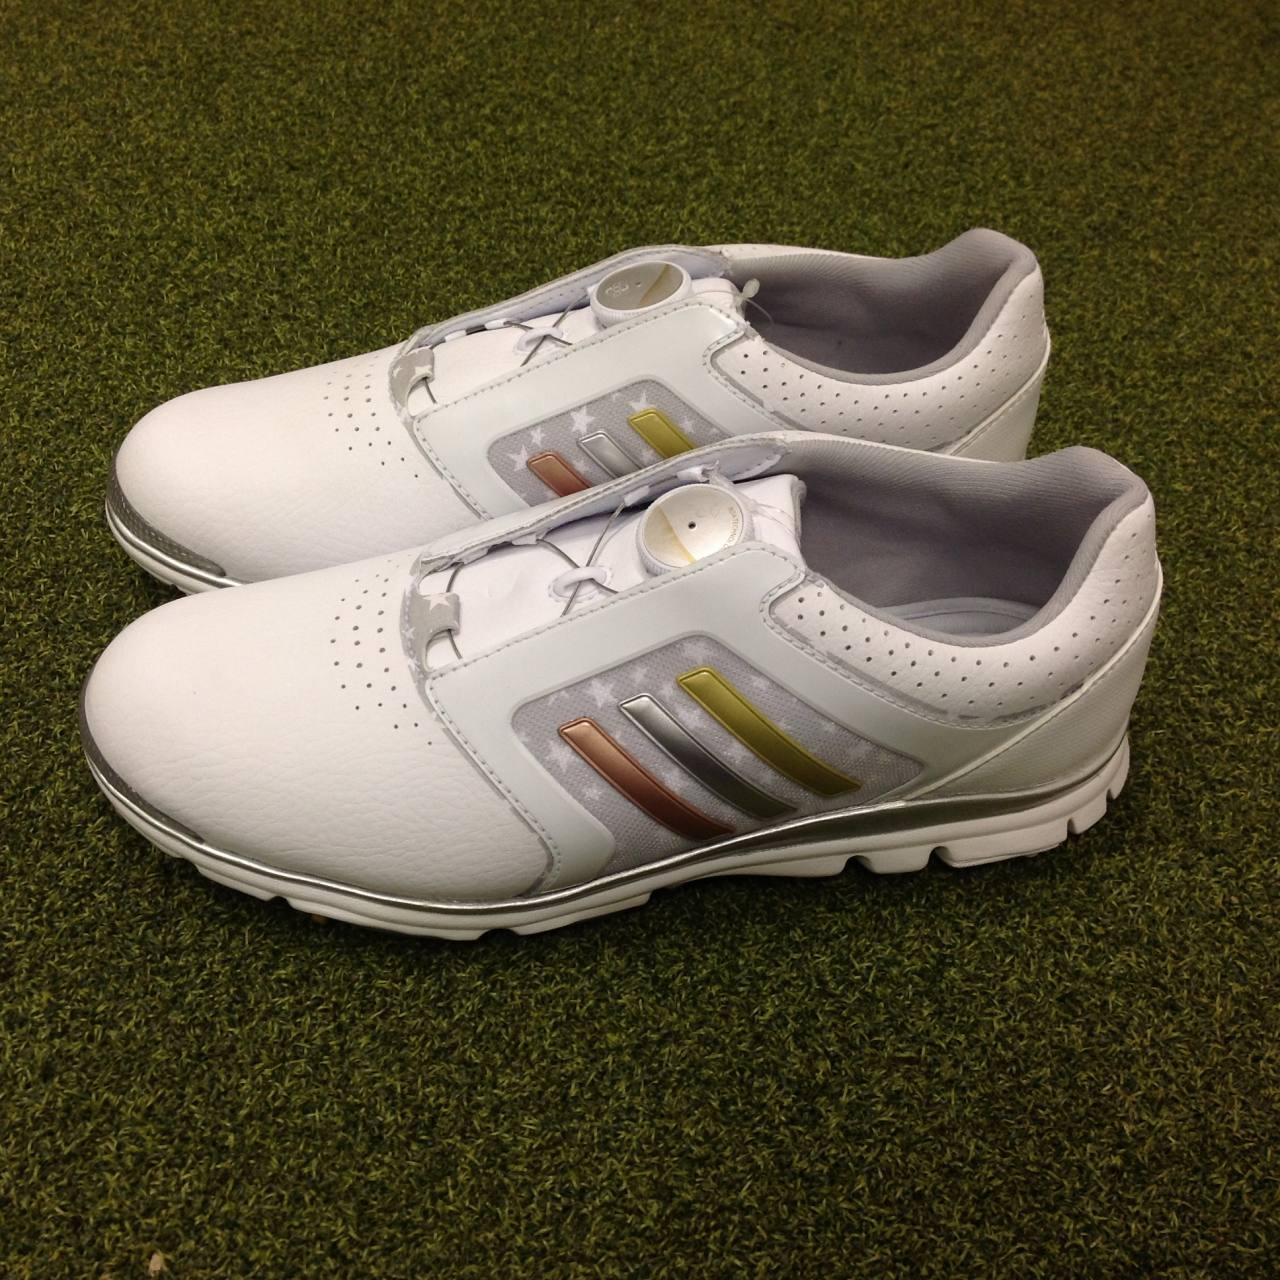 Adidas Adistar Tour Boa Waterproof Golf Shoes